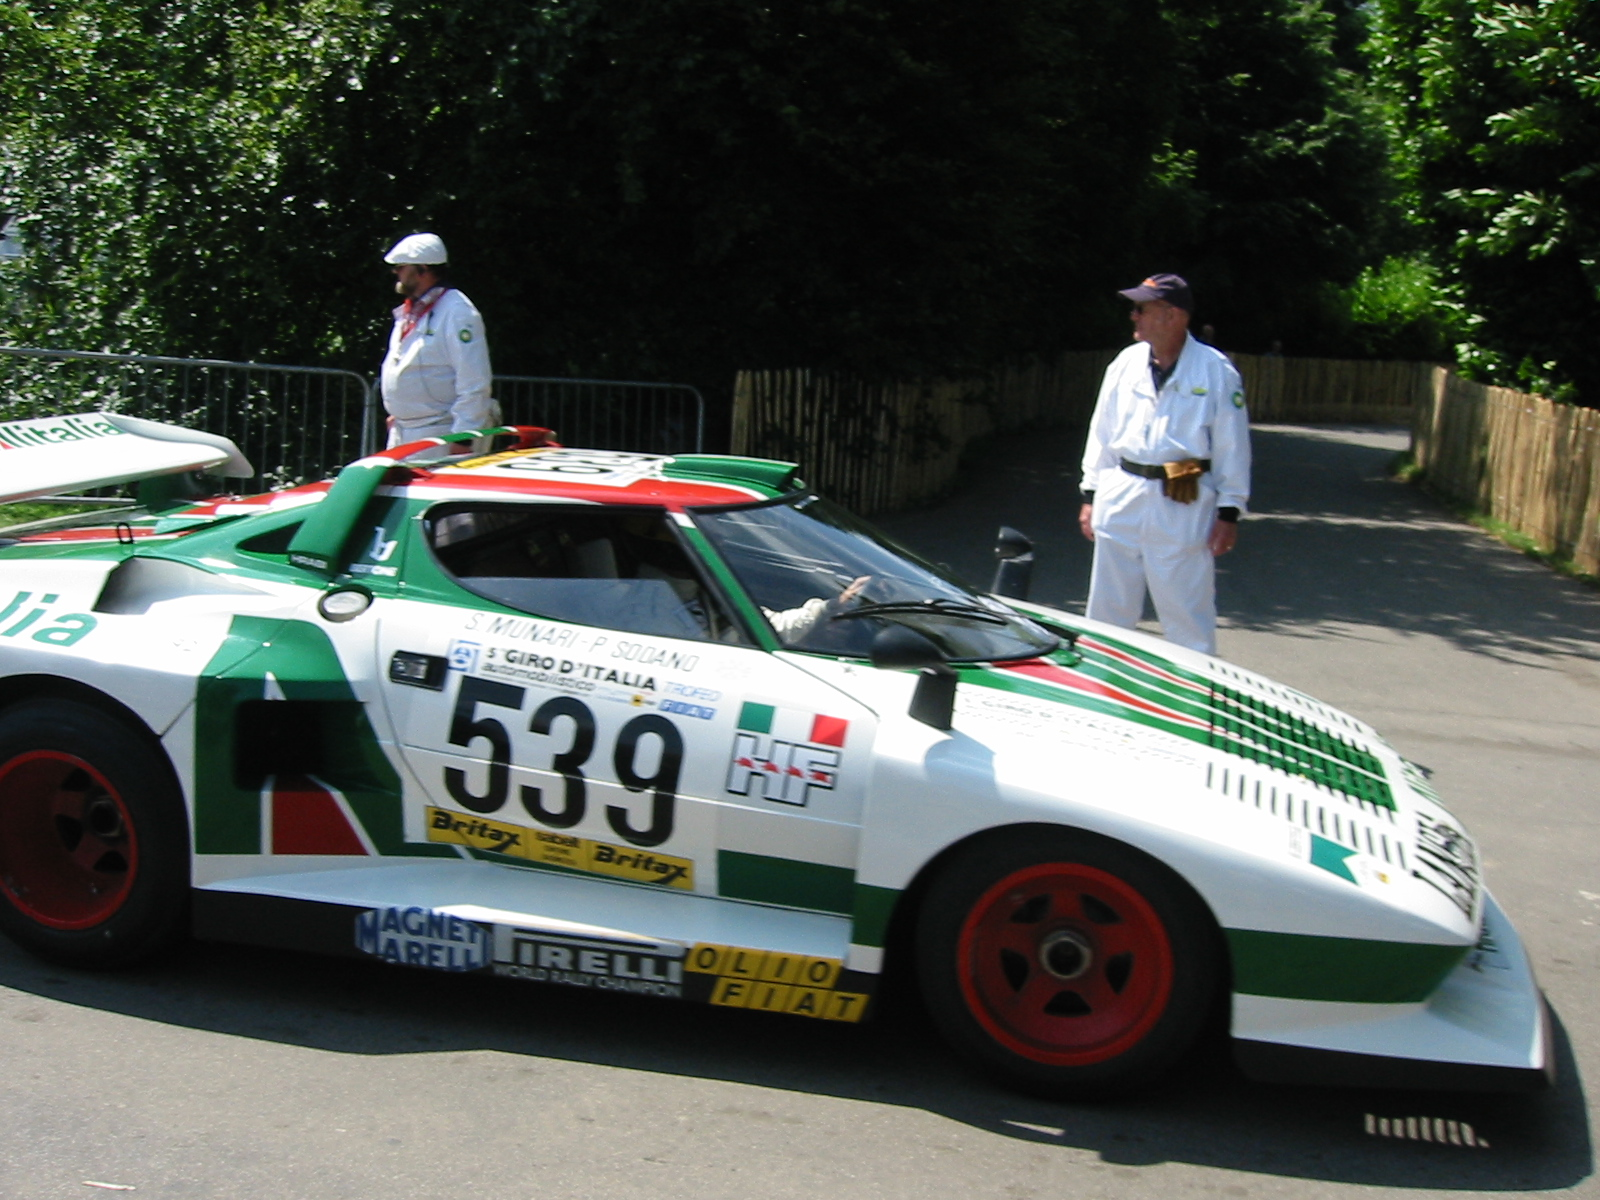 File:Lancia Stratos Turbo.jpg - Wikimedia Commons